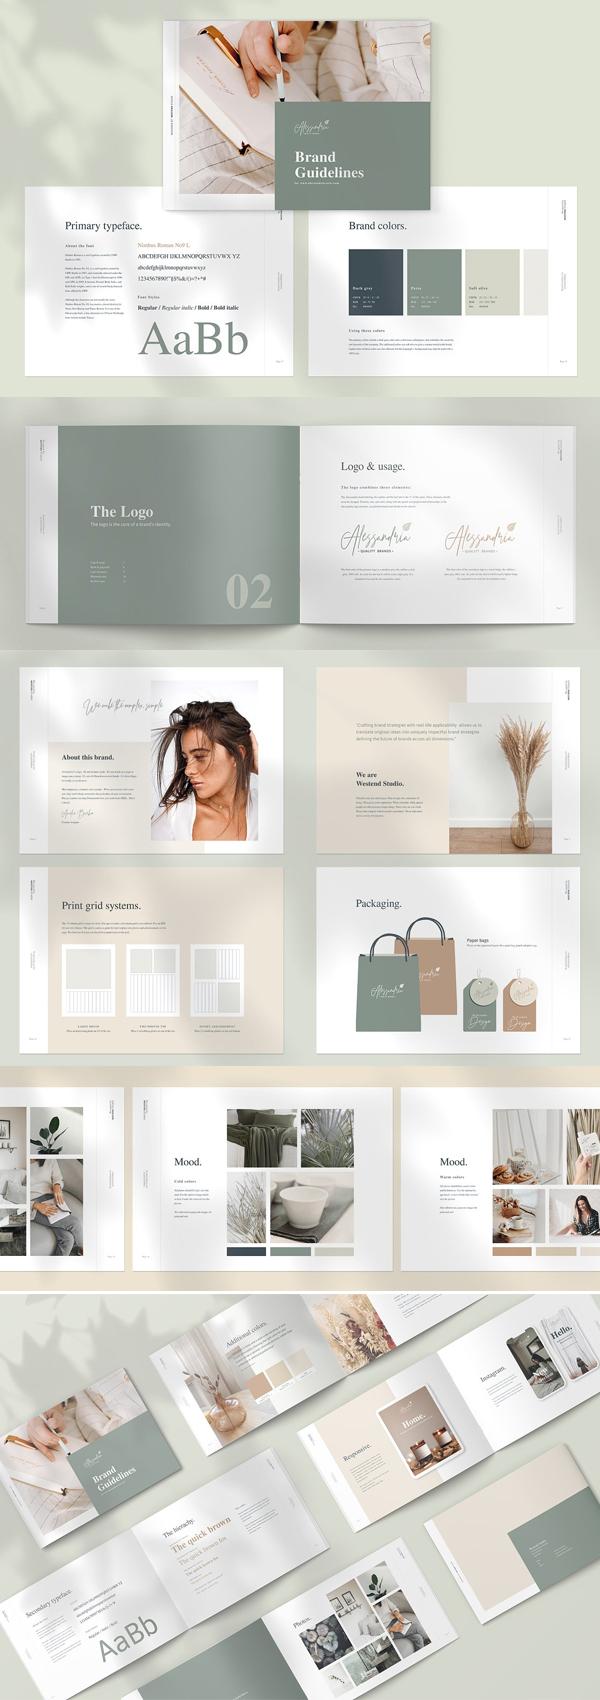 Alessandria - Brand Guidelines